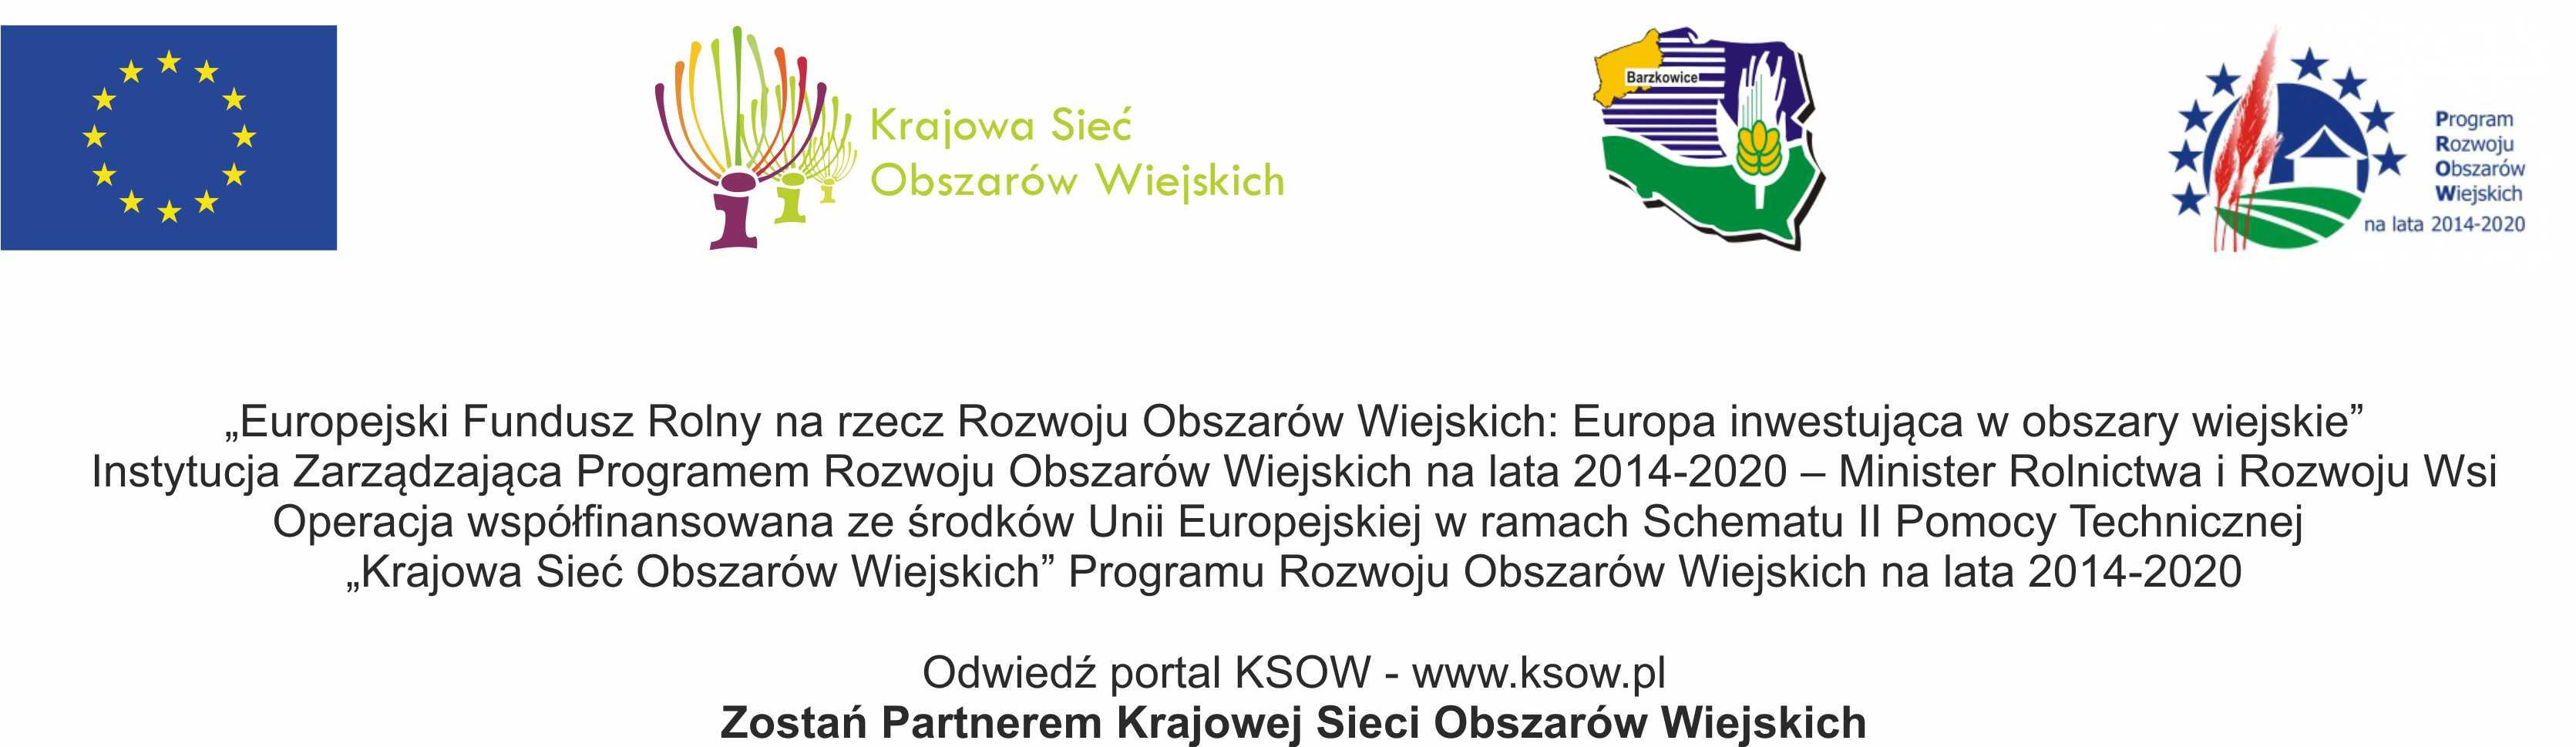 https://m.wm.pl/2020/09/orig/glowka-bez-ue-648630.jpg